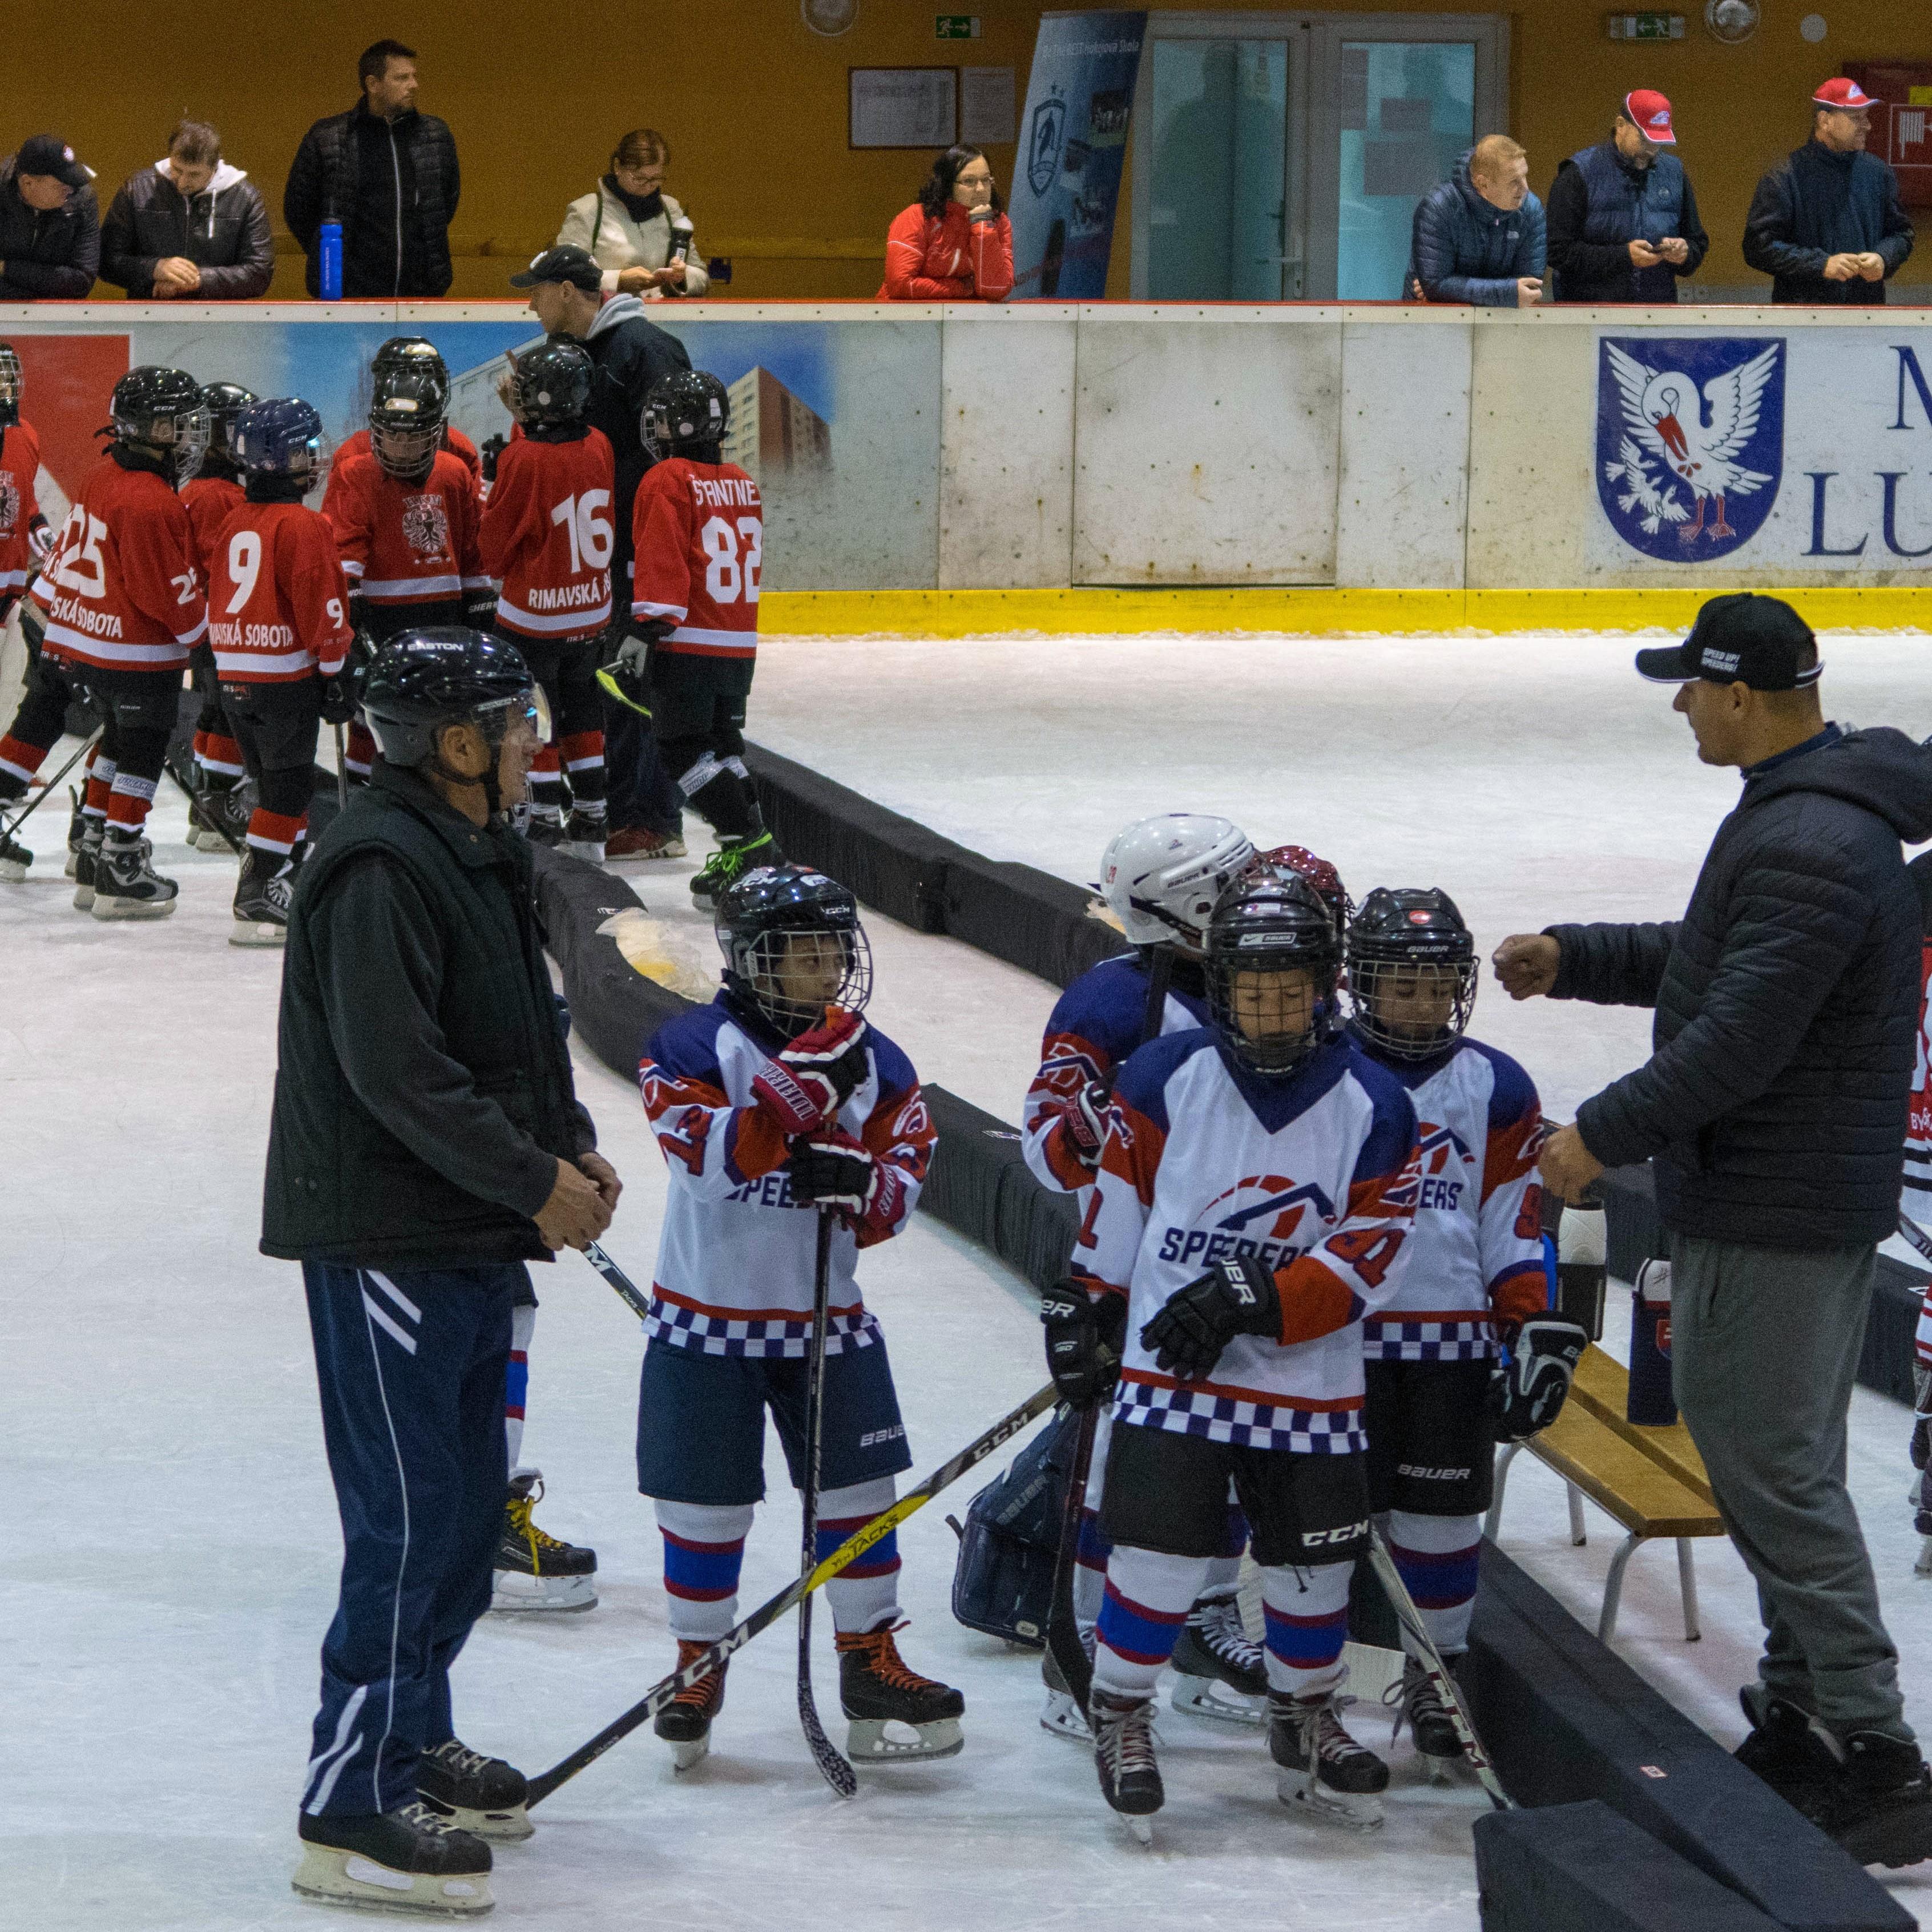 Speeders_sezona 2018_19 hokej turnaj lucenec 2